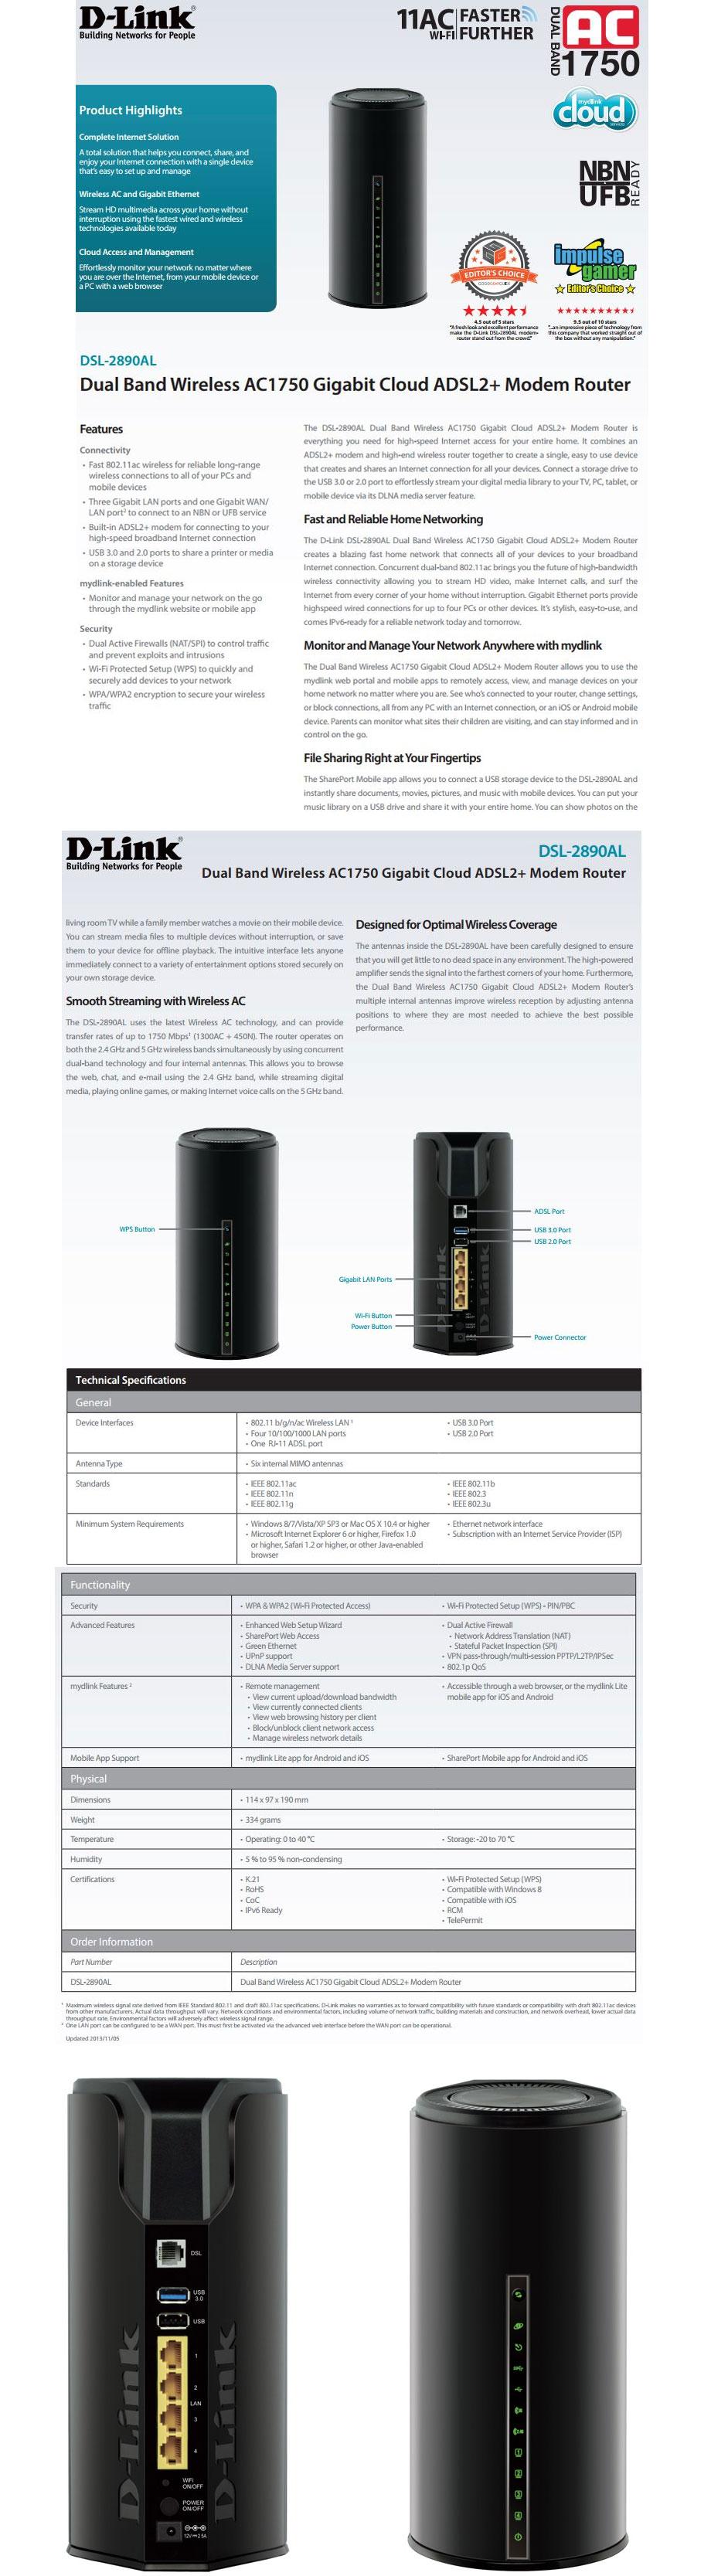 D-Link DSL-2890AL